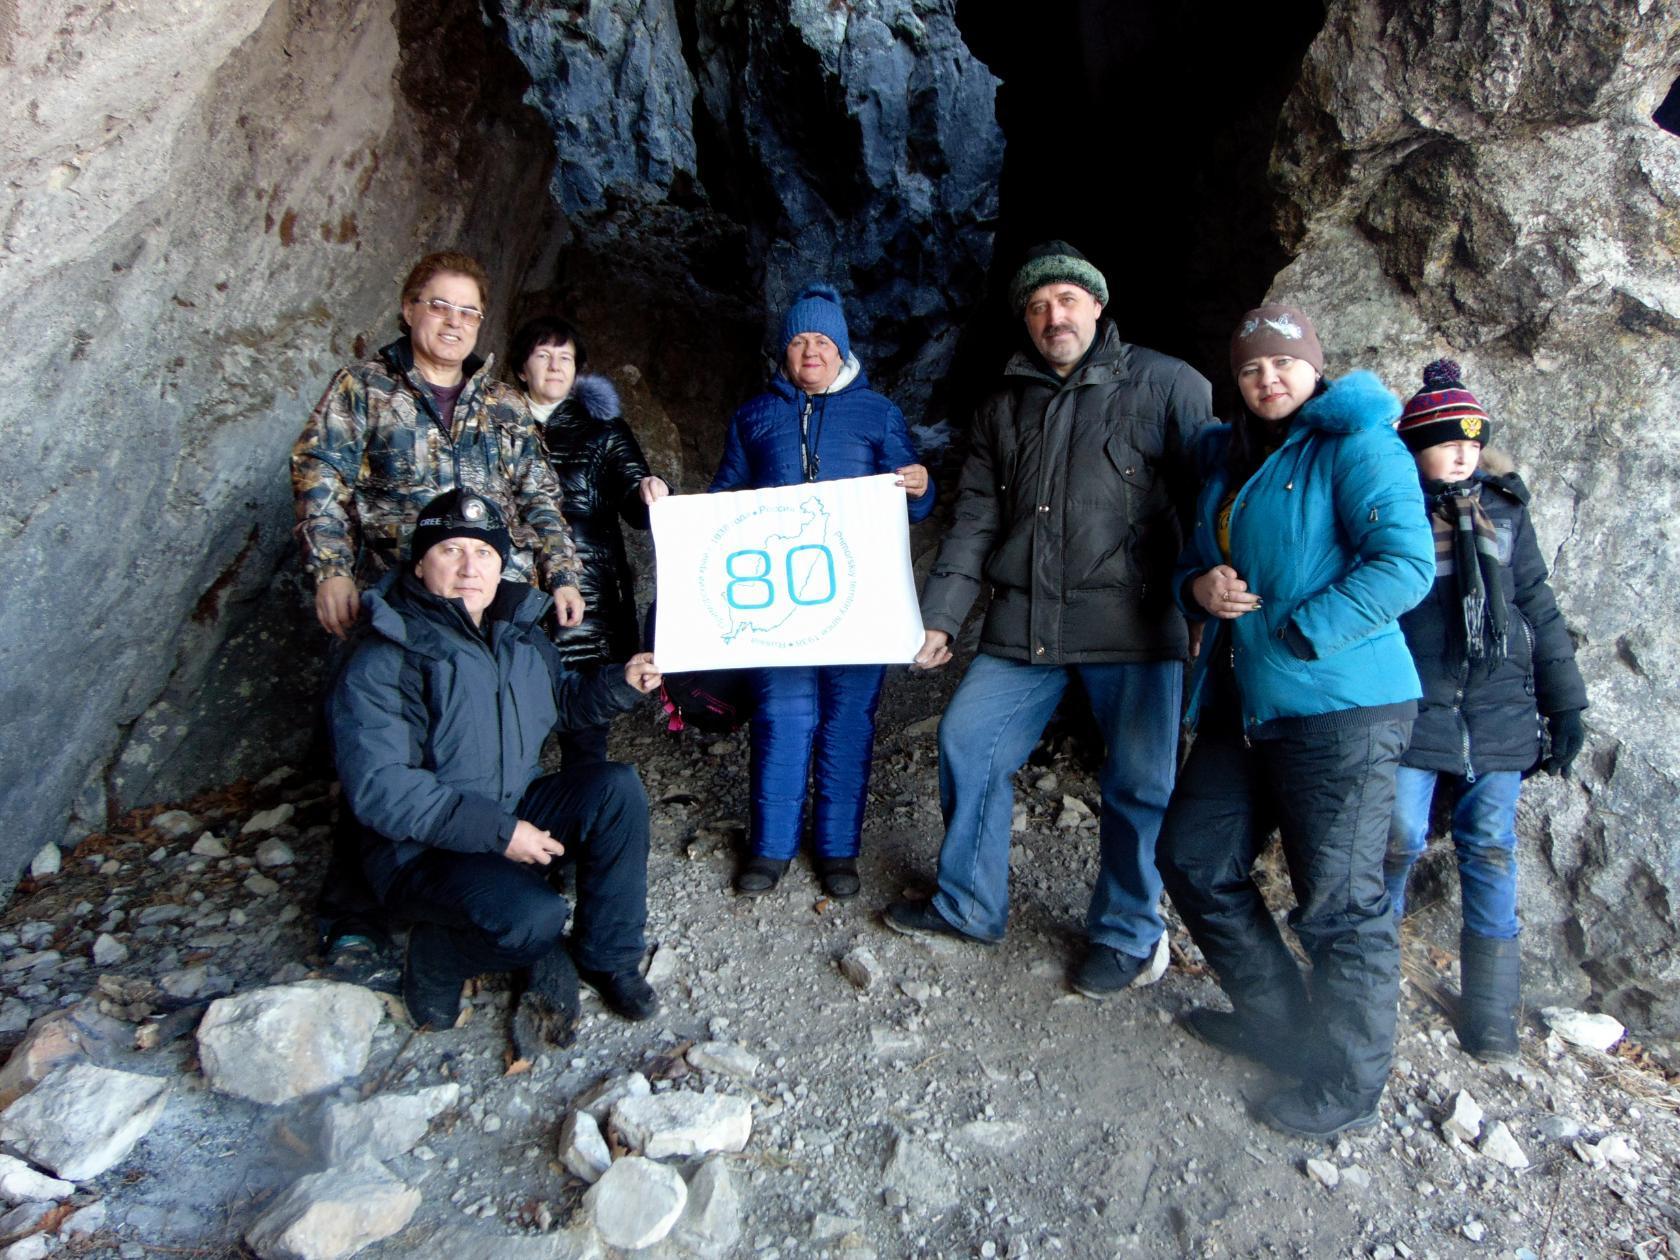 В пещере  Мечта спелеолога. Фото Евгения Ковешникова